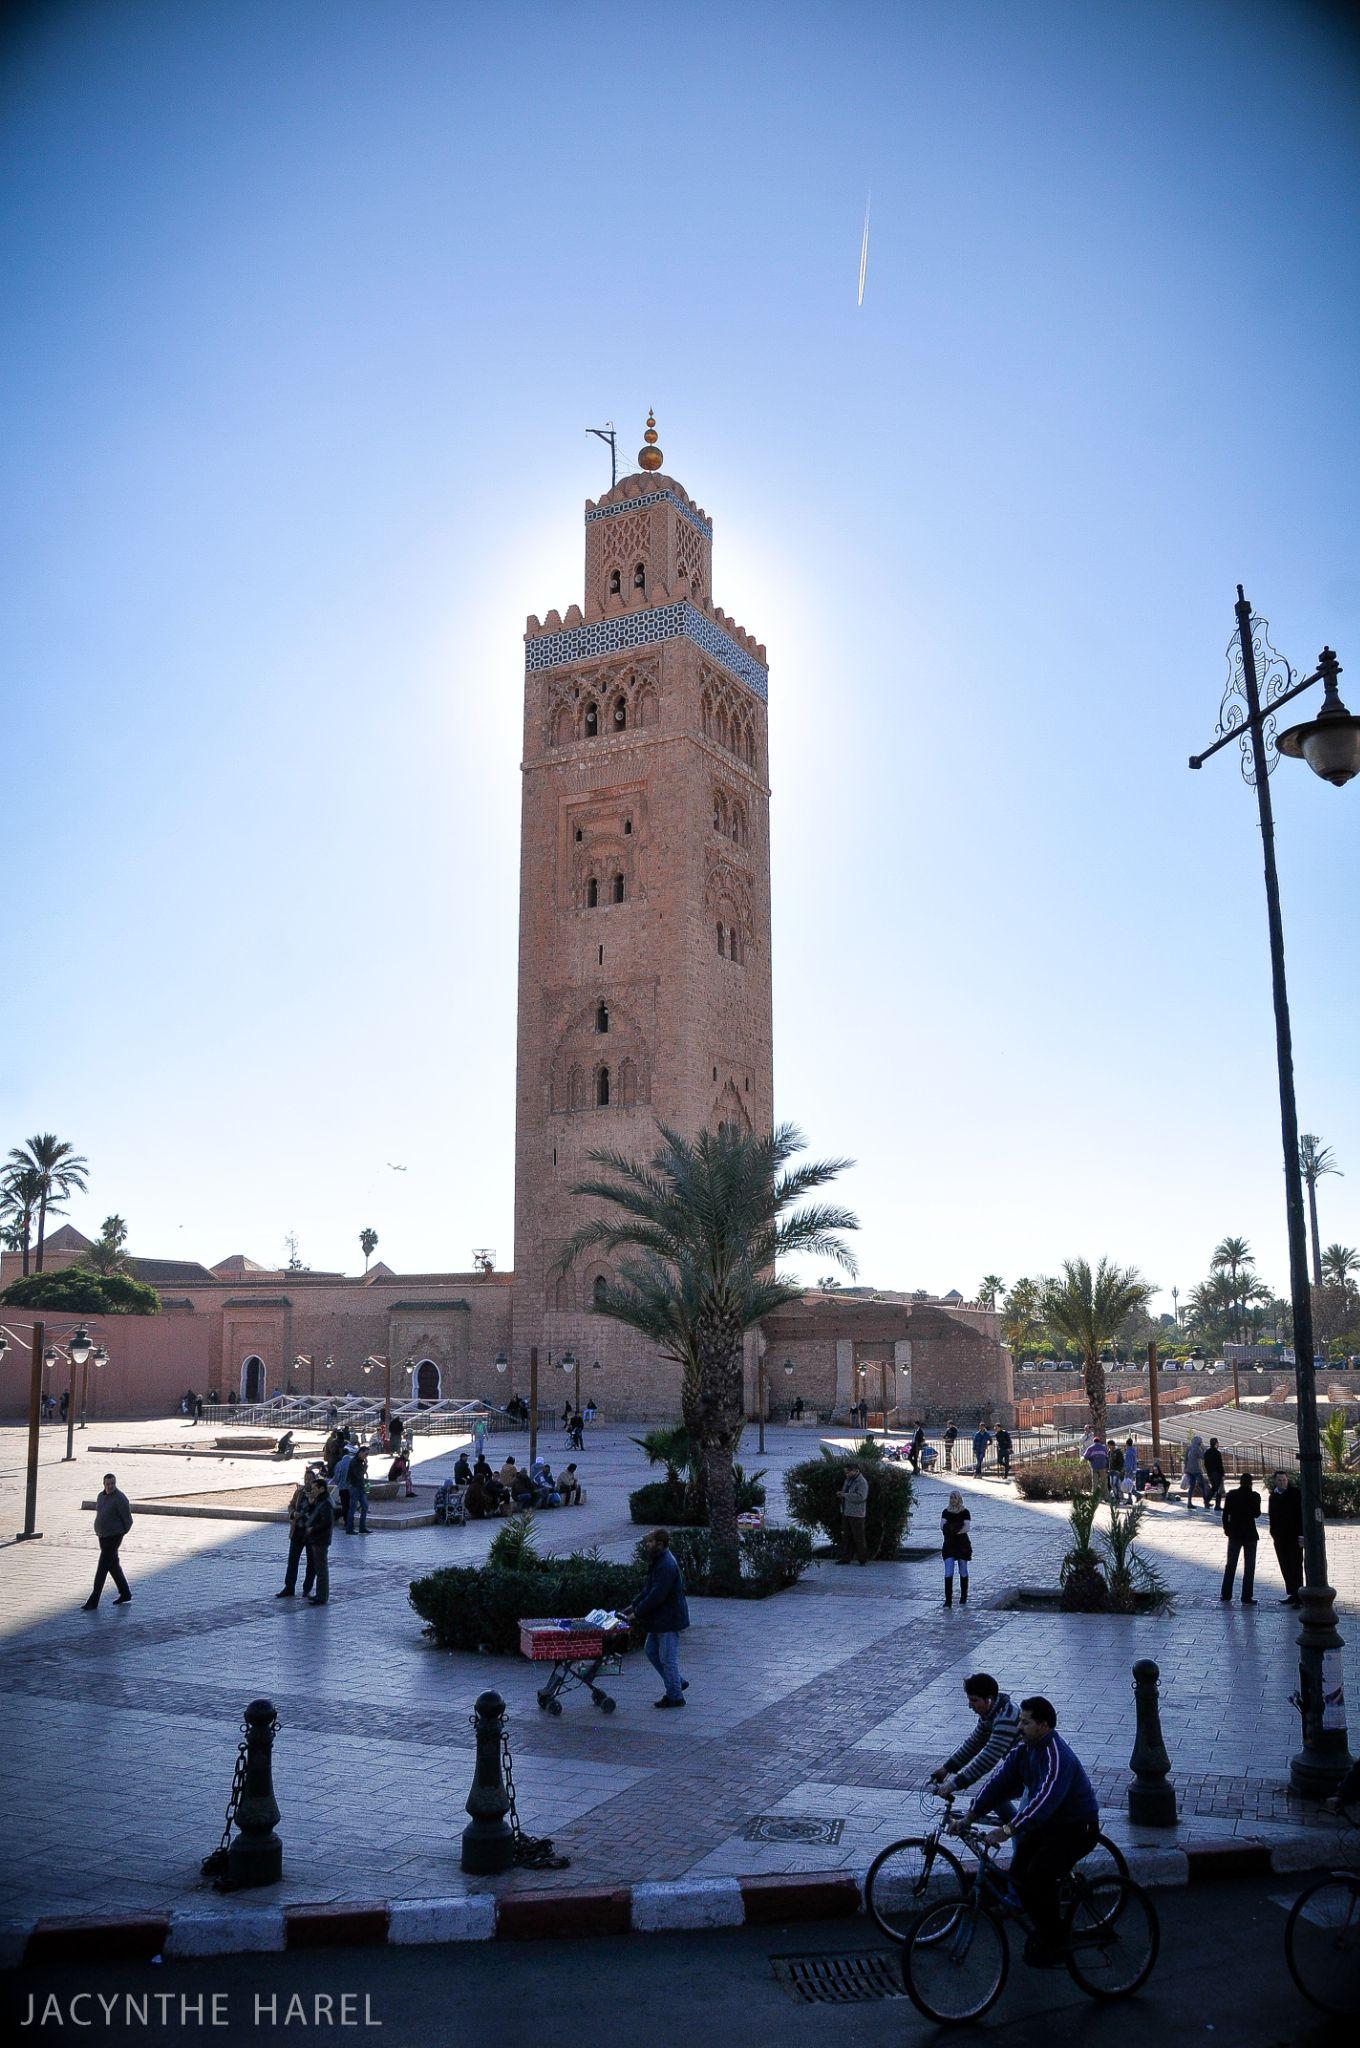 Koutoubia, Marrakech by jacynthe.harel